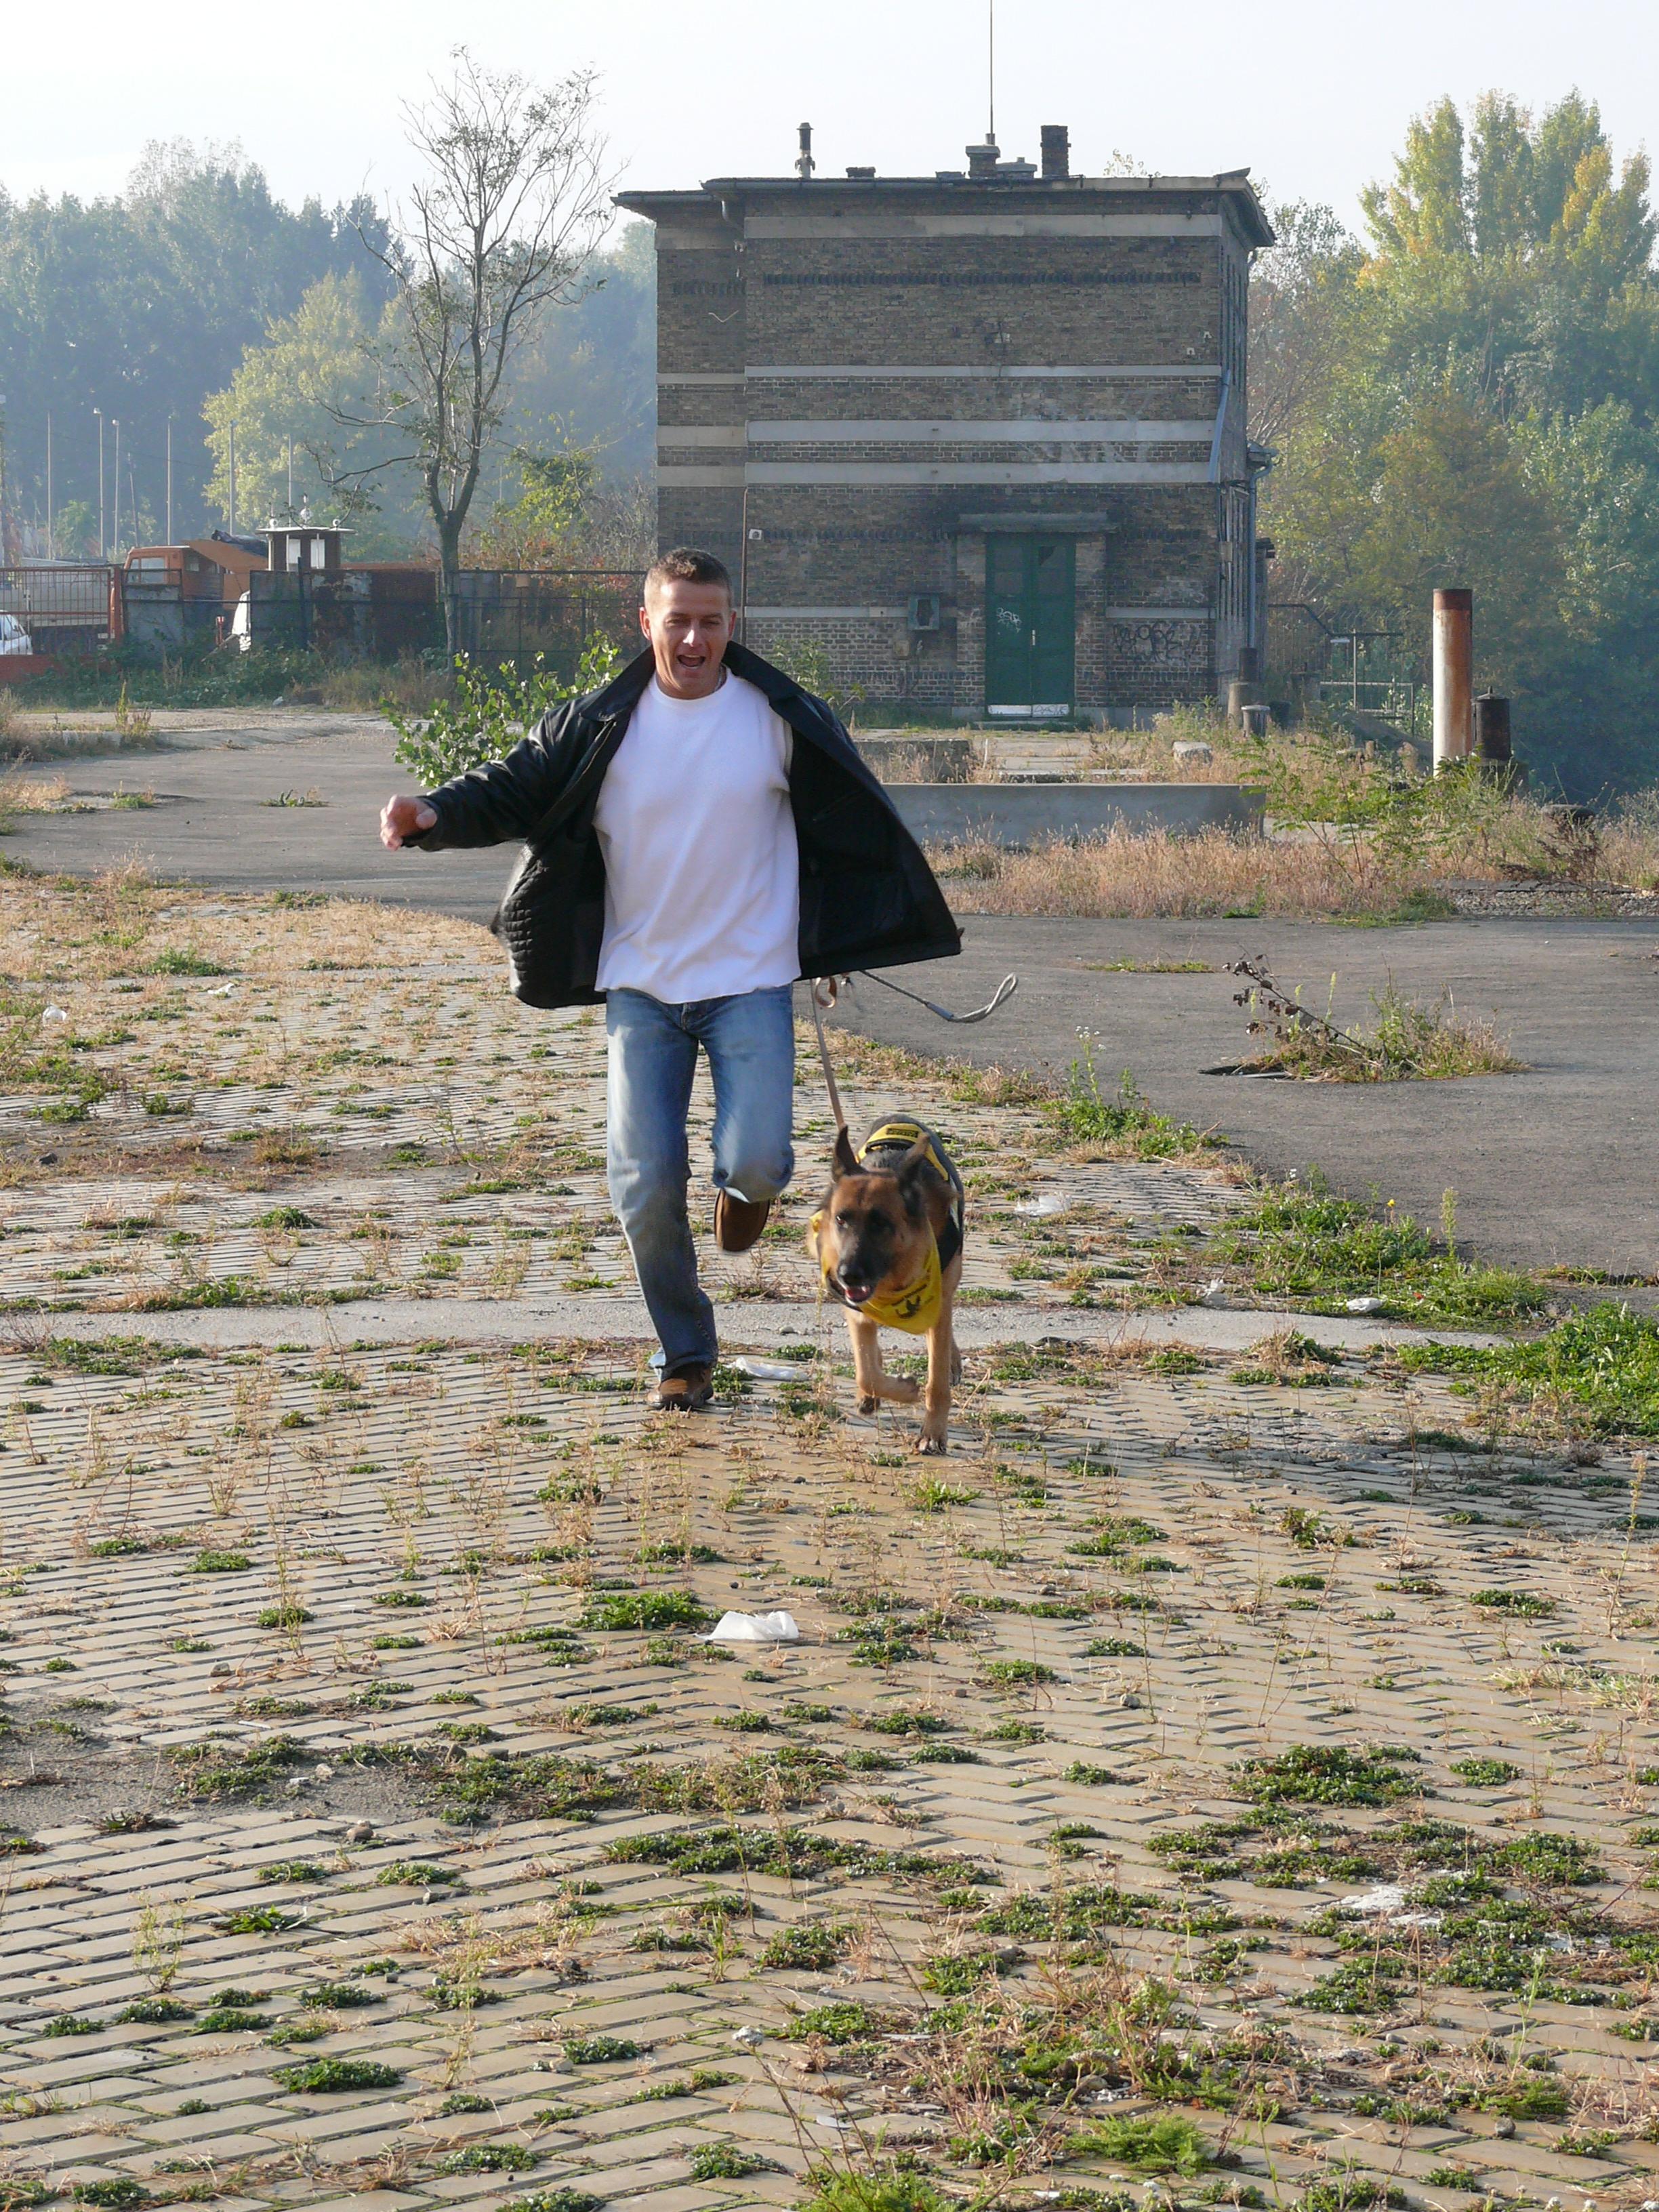 Rékasi Károly és Lavina futnak a Duna-parton